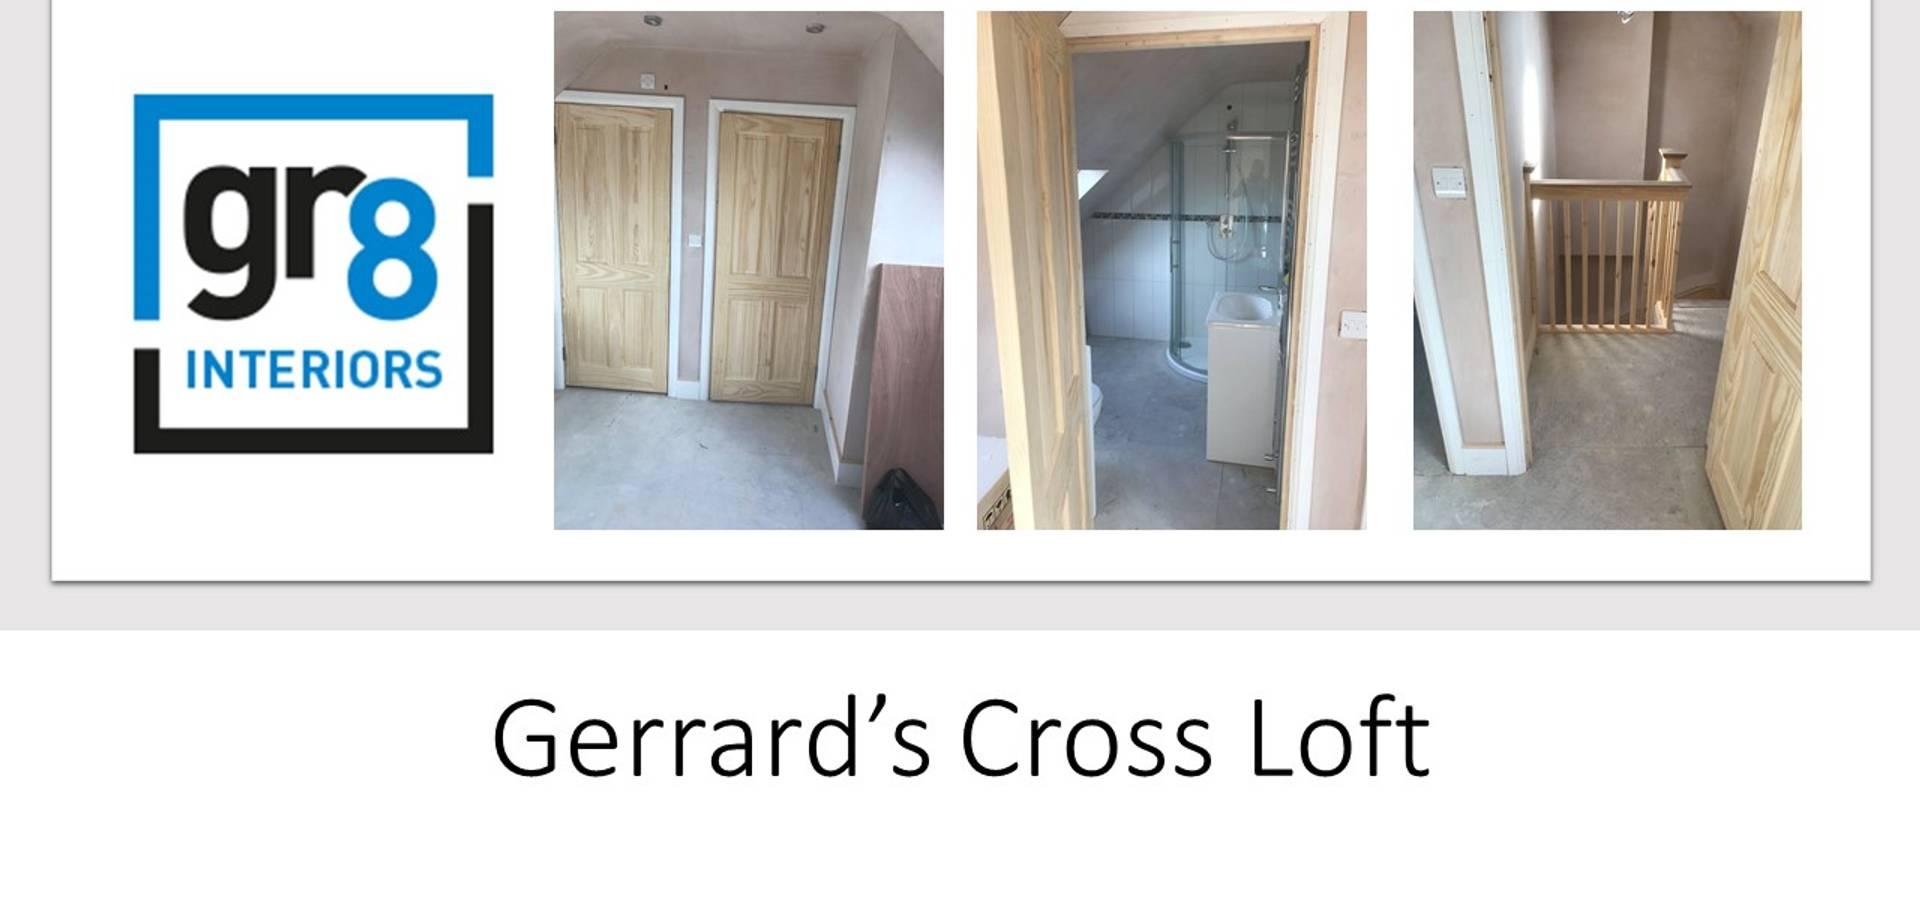 Gr8 Interiors Ltd